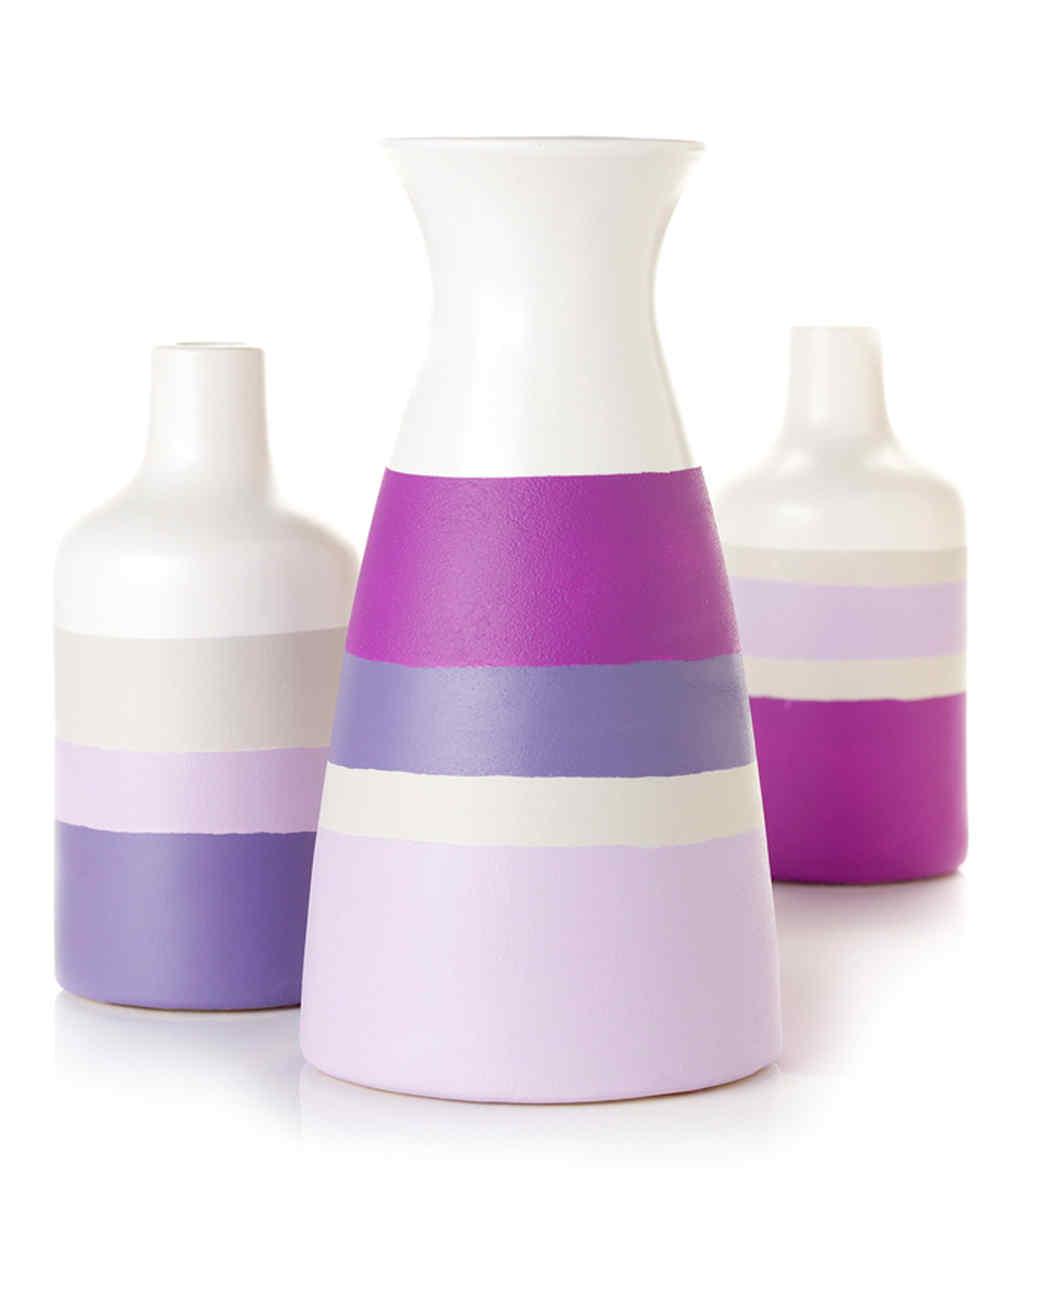 mscrafts-pantone-jars-mrkt-0514.jpg